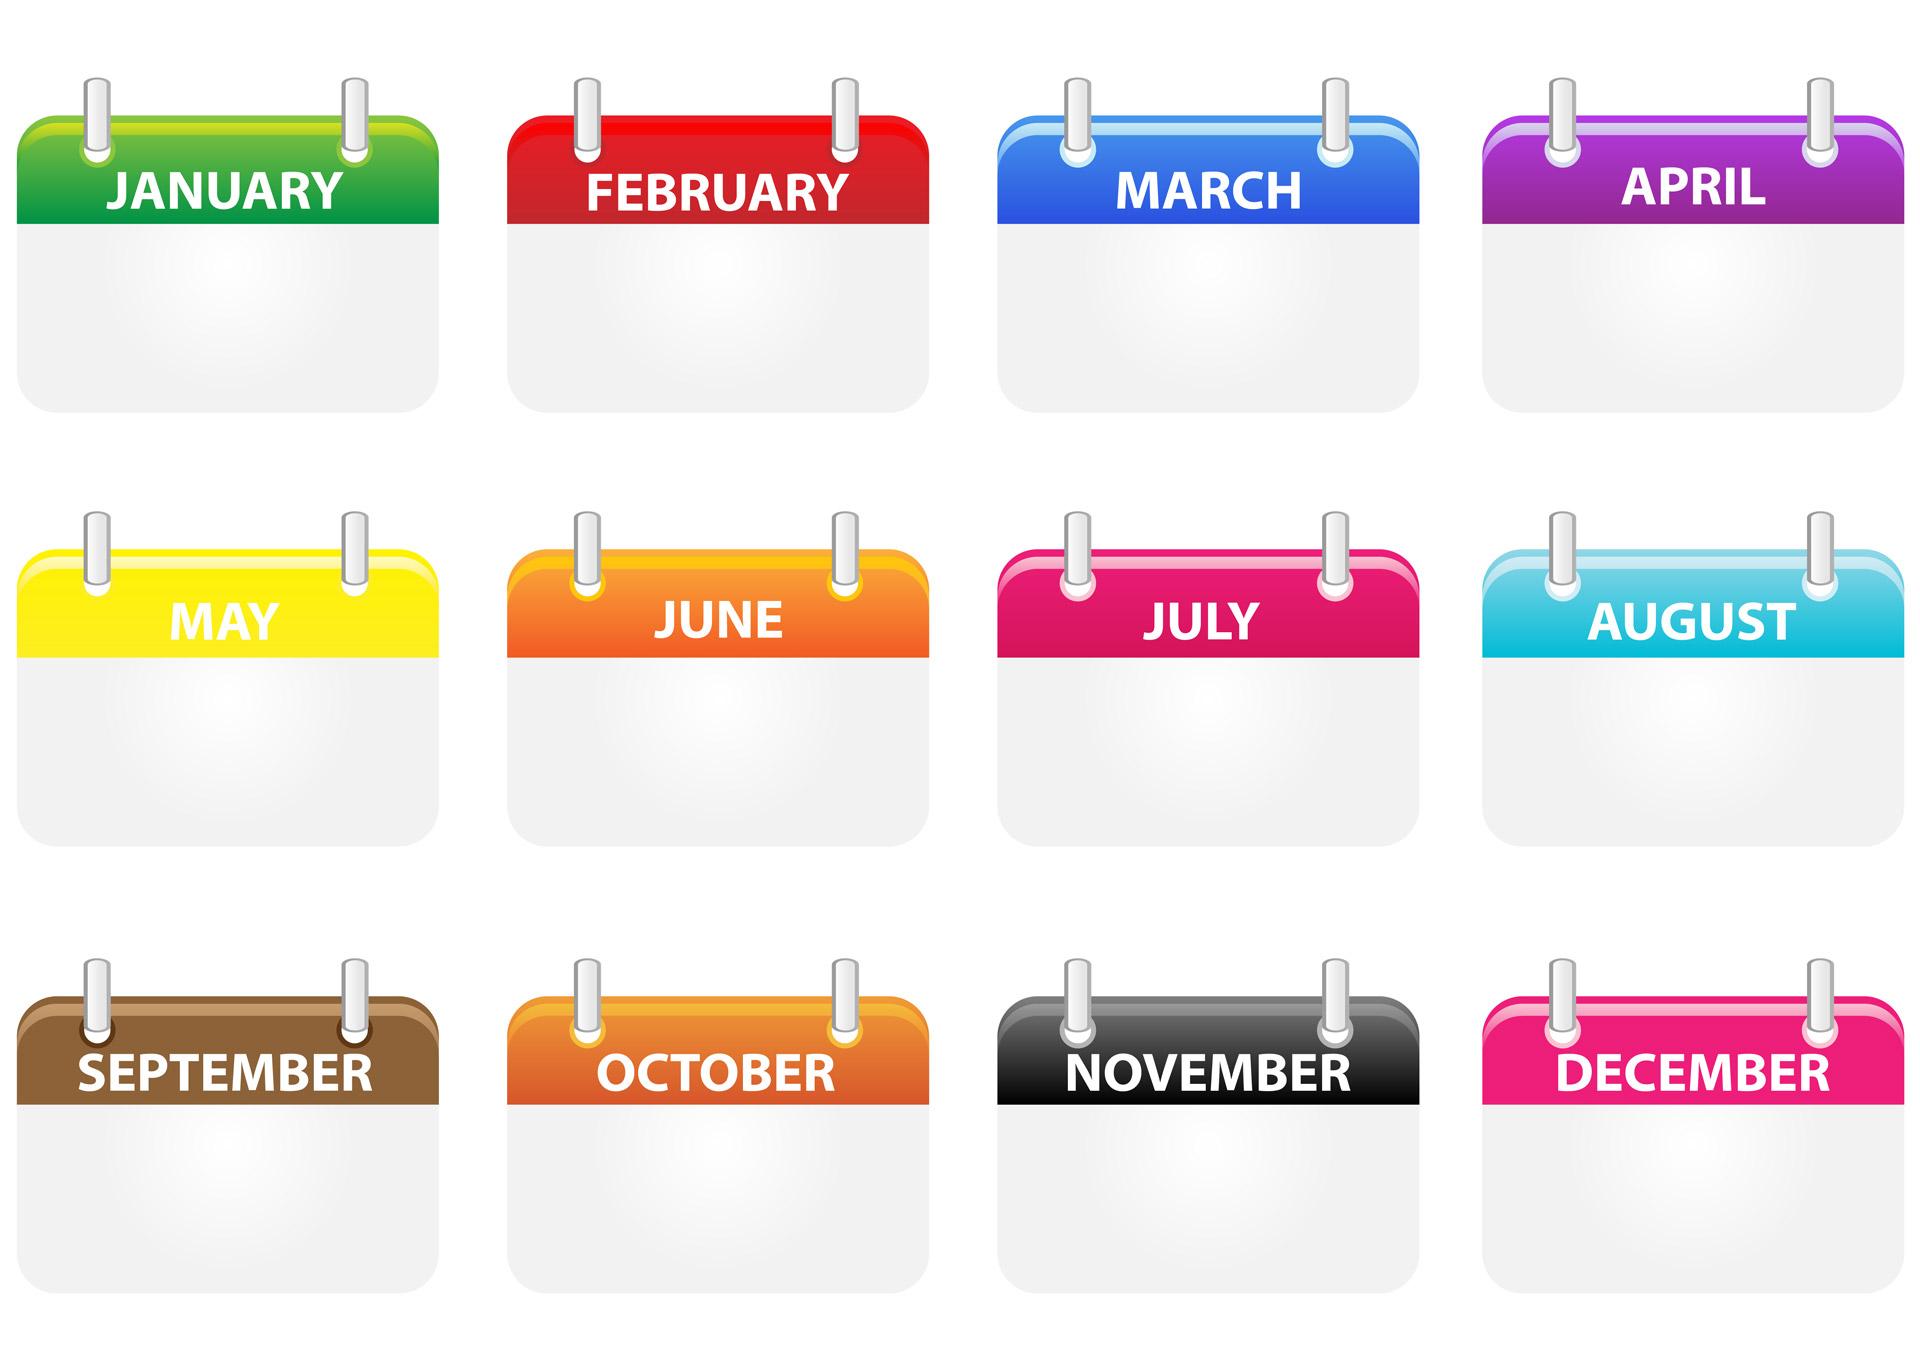 Calendar Clip Art February 2020 Term Dates   Greenway Kindergarten